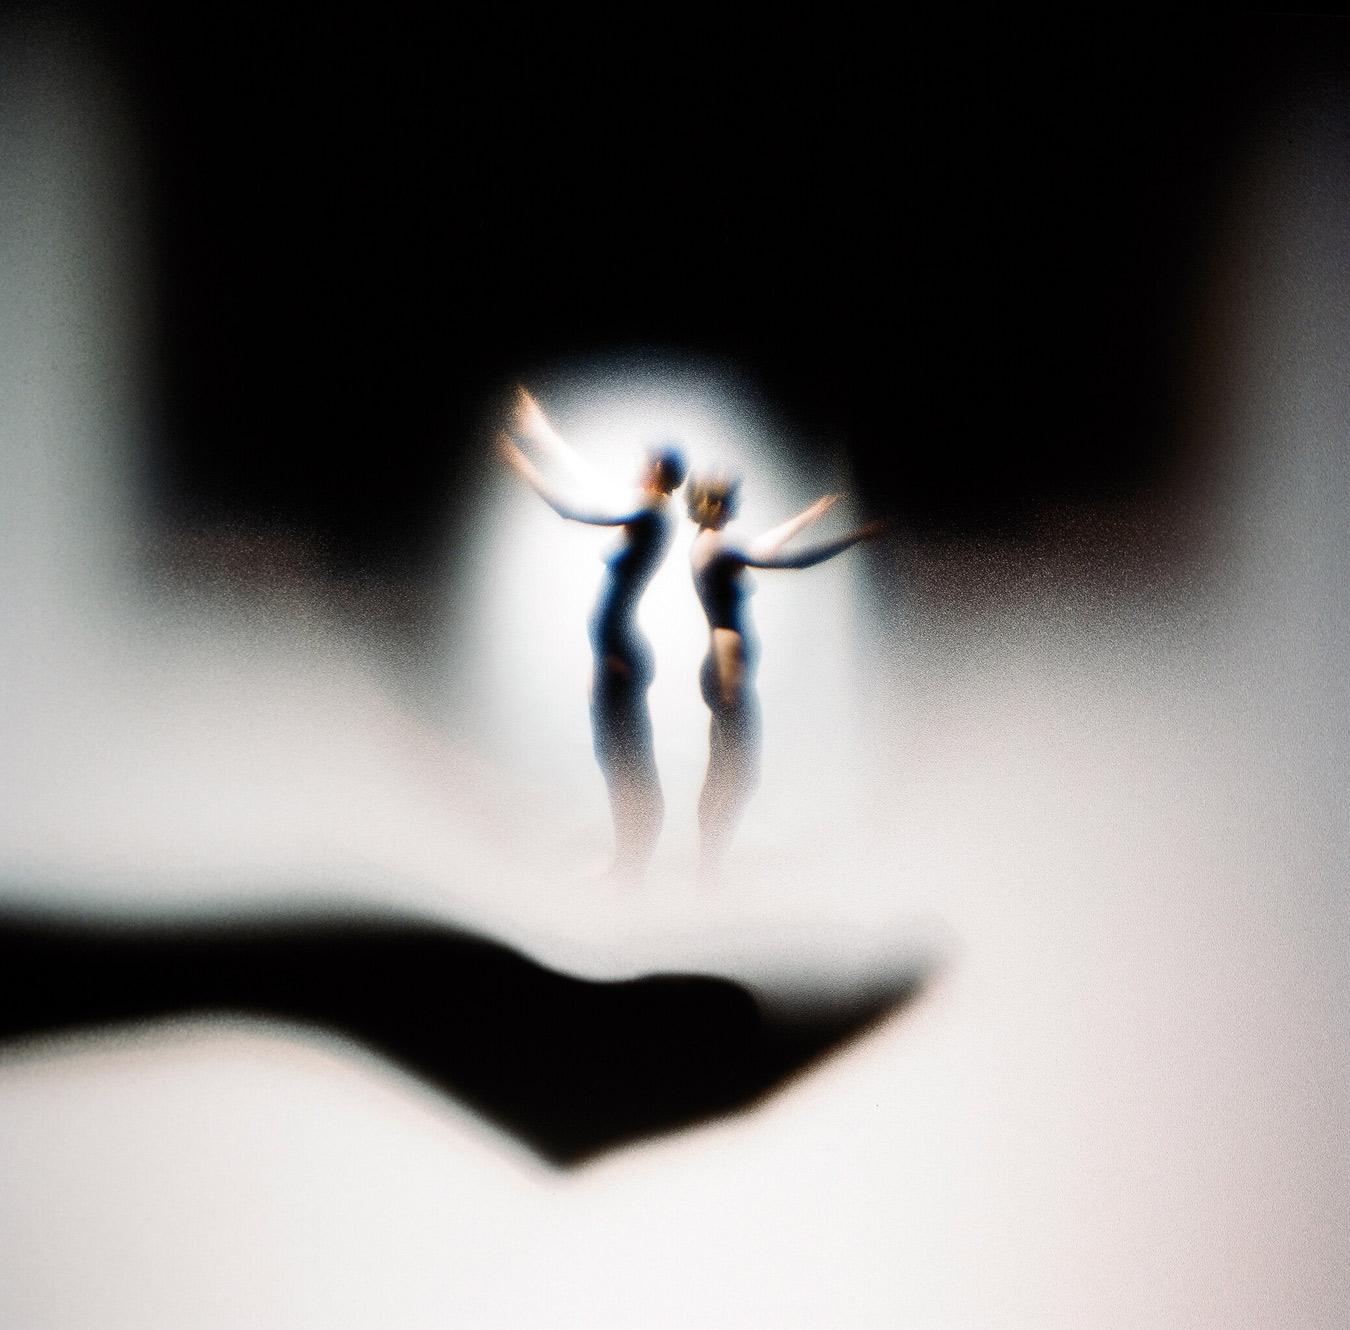 LA SEMILLA DE LA IMAGEN XV serie I. Fotografía analógica, 2009